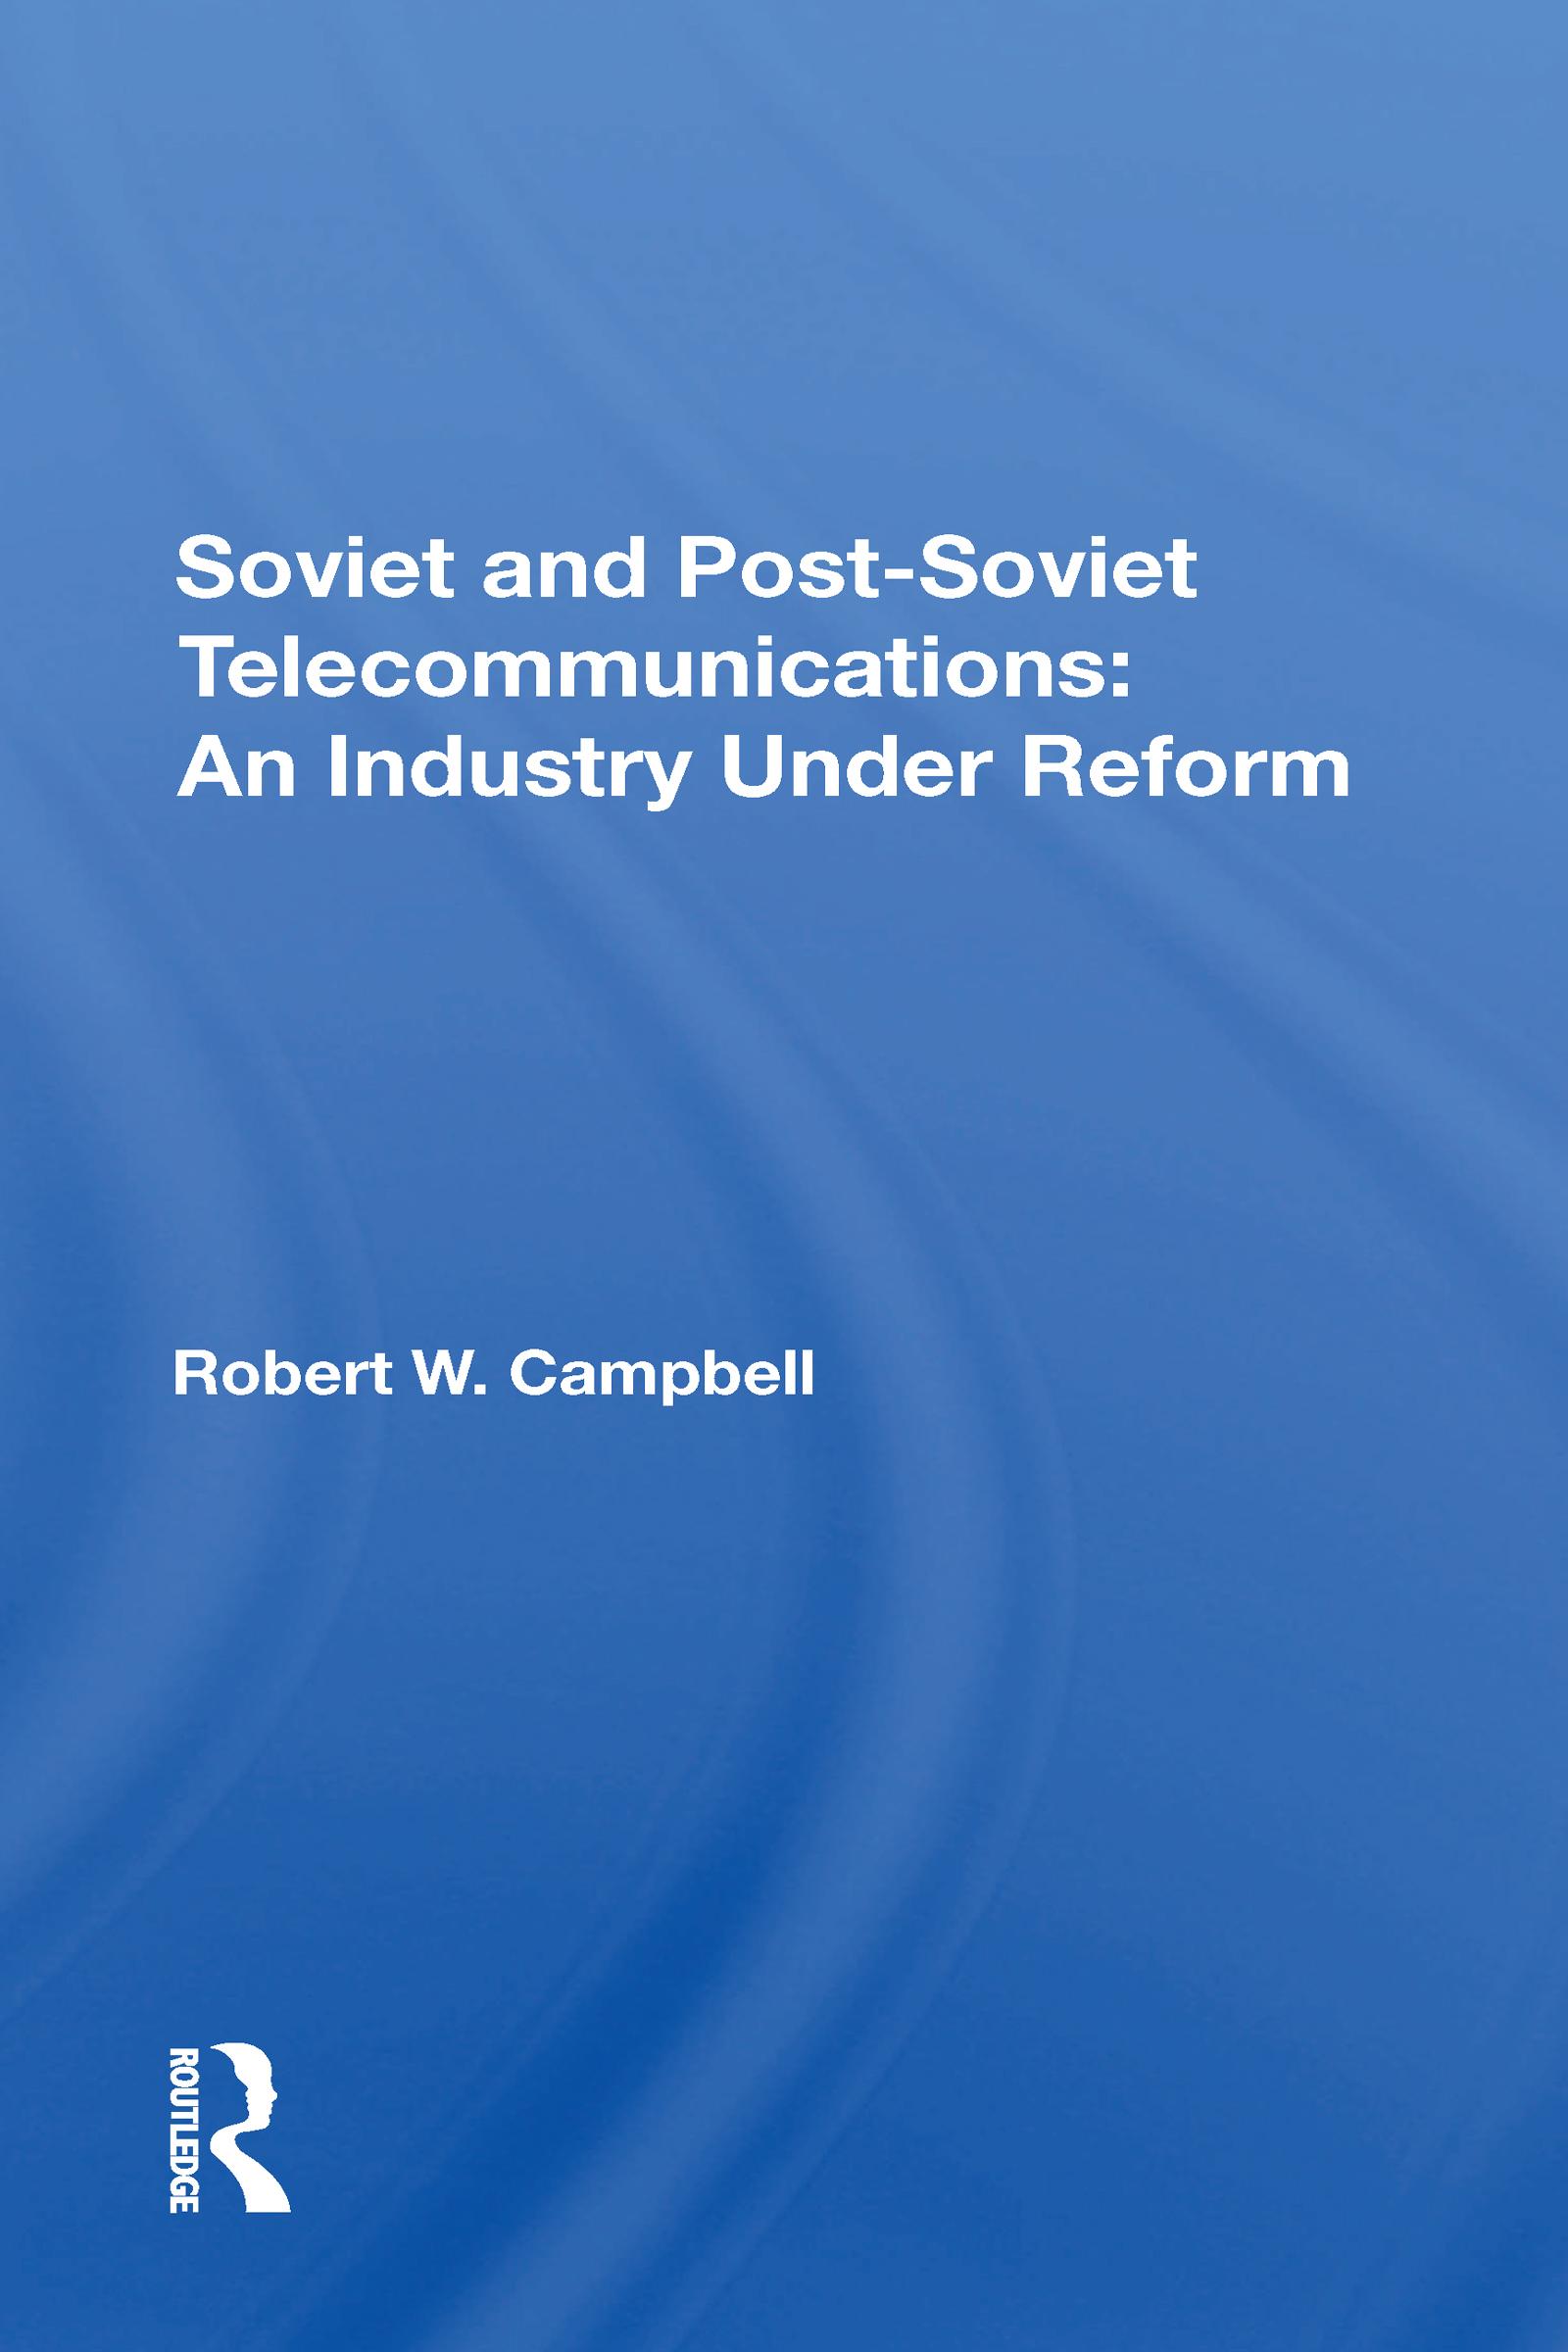 Soviet And Post-Soviet Telecommunications